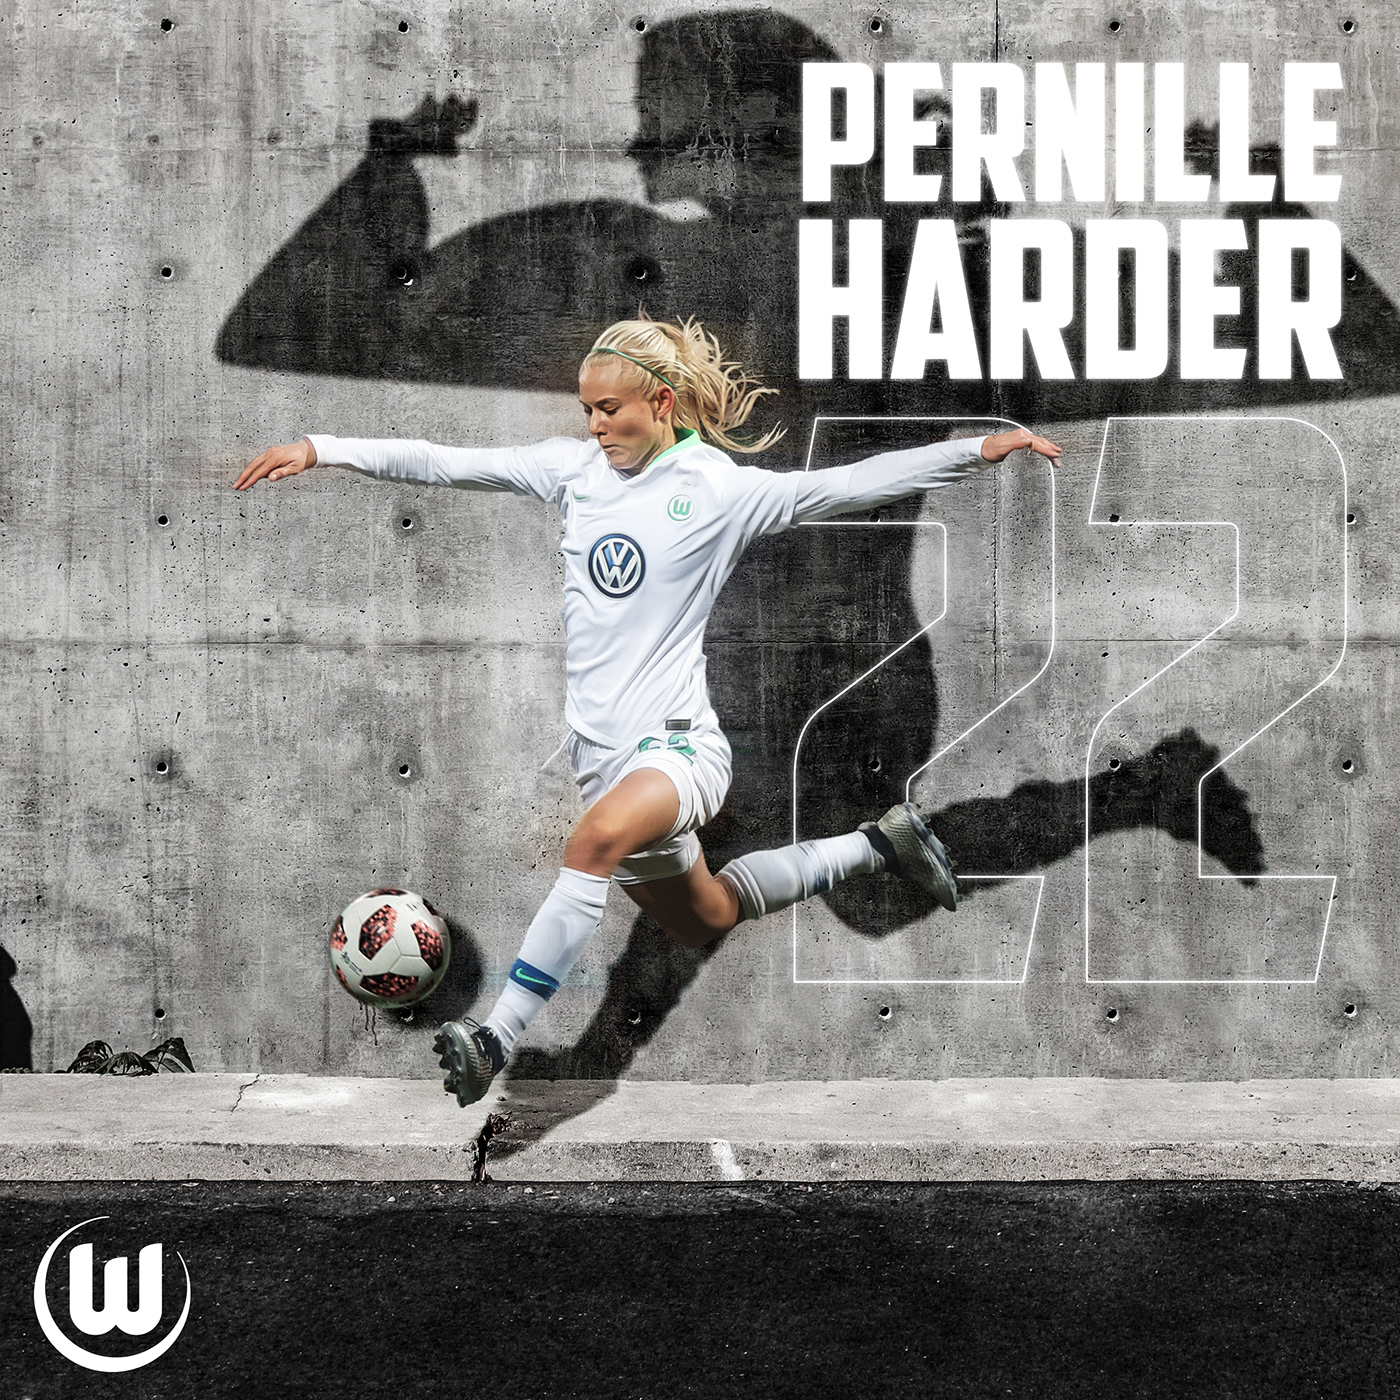 Pernille Harder on Behance